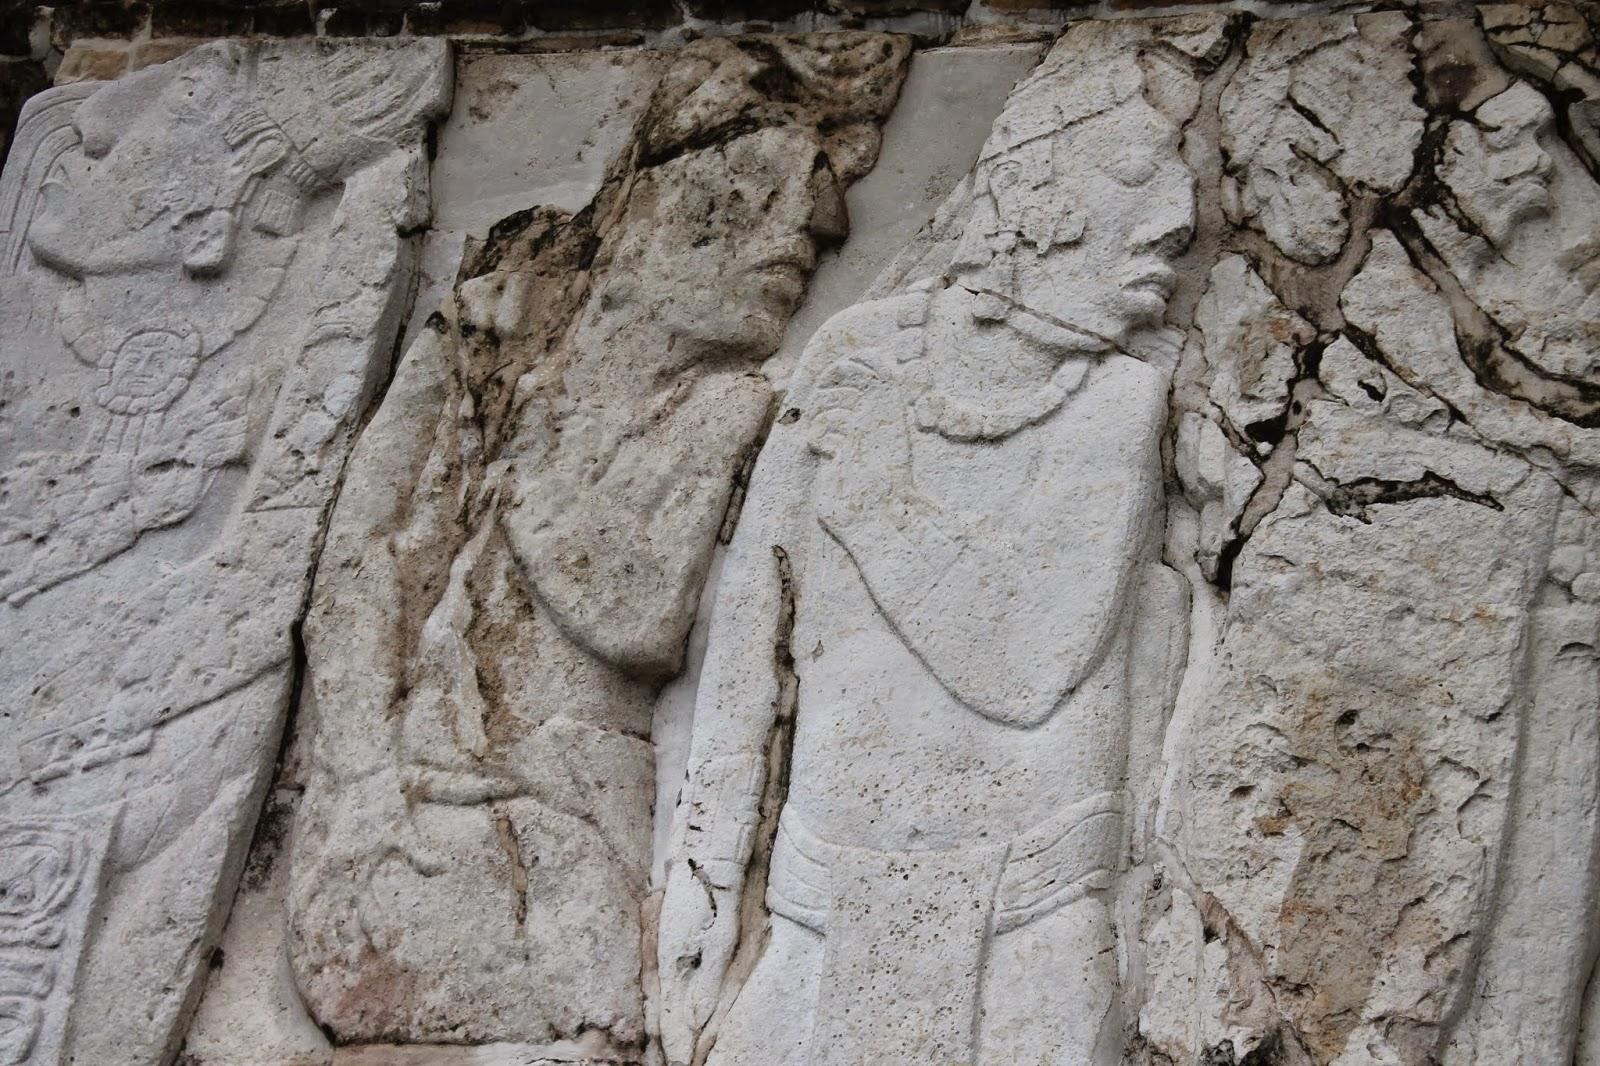 basso rilievi sito archeologico palenque_ chiapas messico